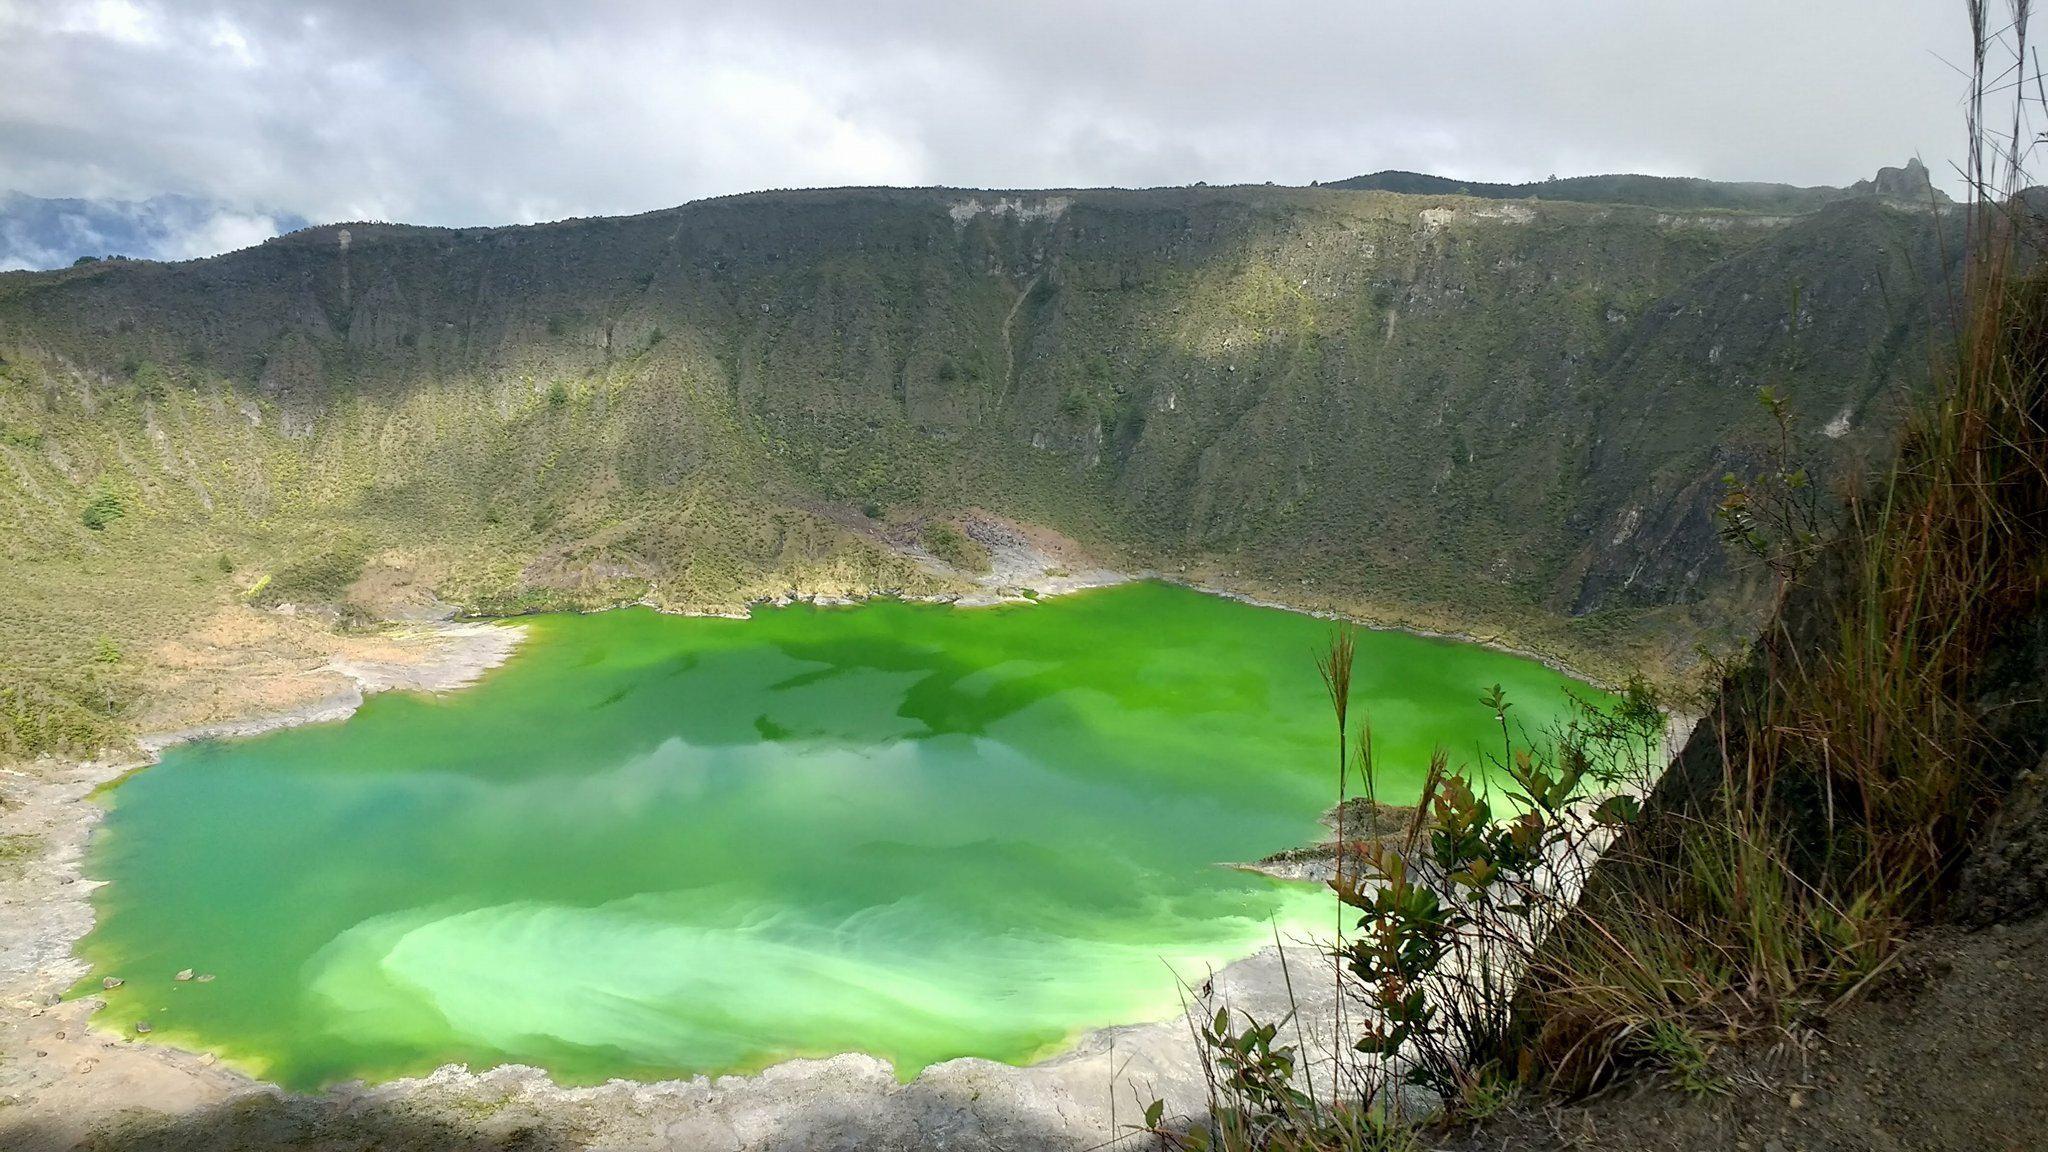 Camping Volcan Chichonal cover-0 en Villahermosa, Tab., México   Journey,  Villahermosa, Actividades